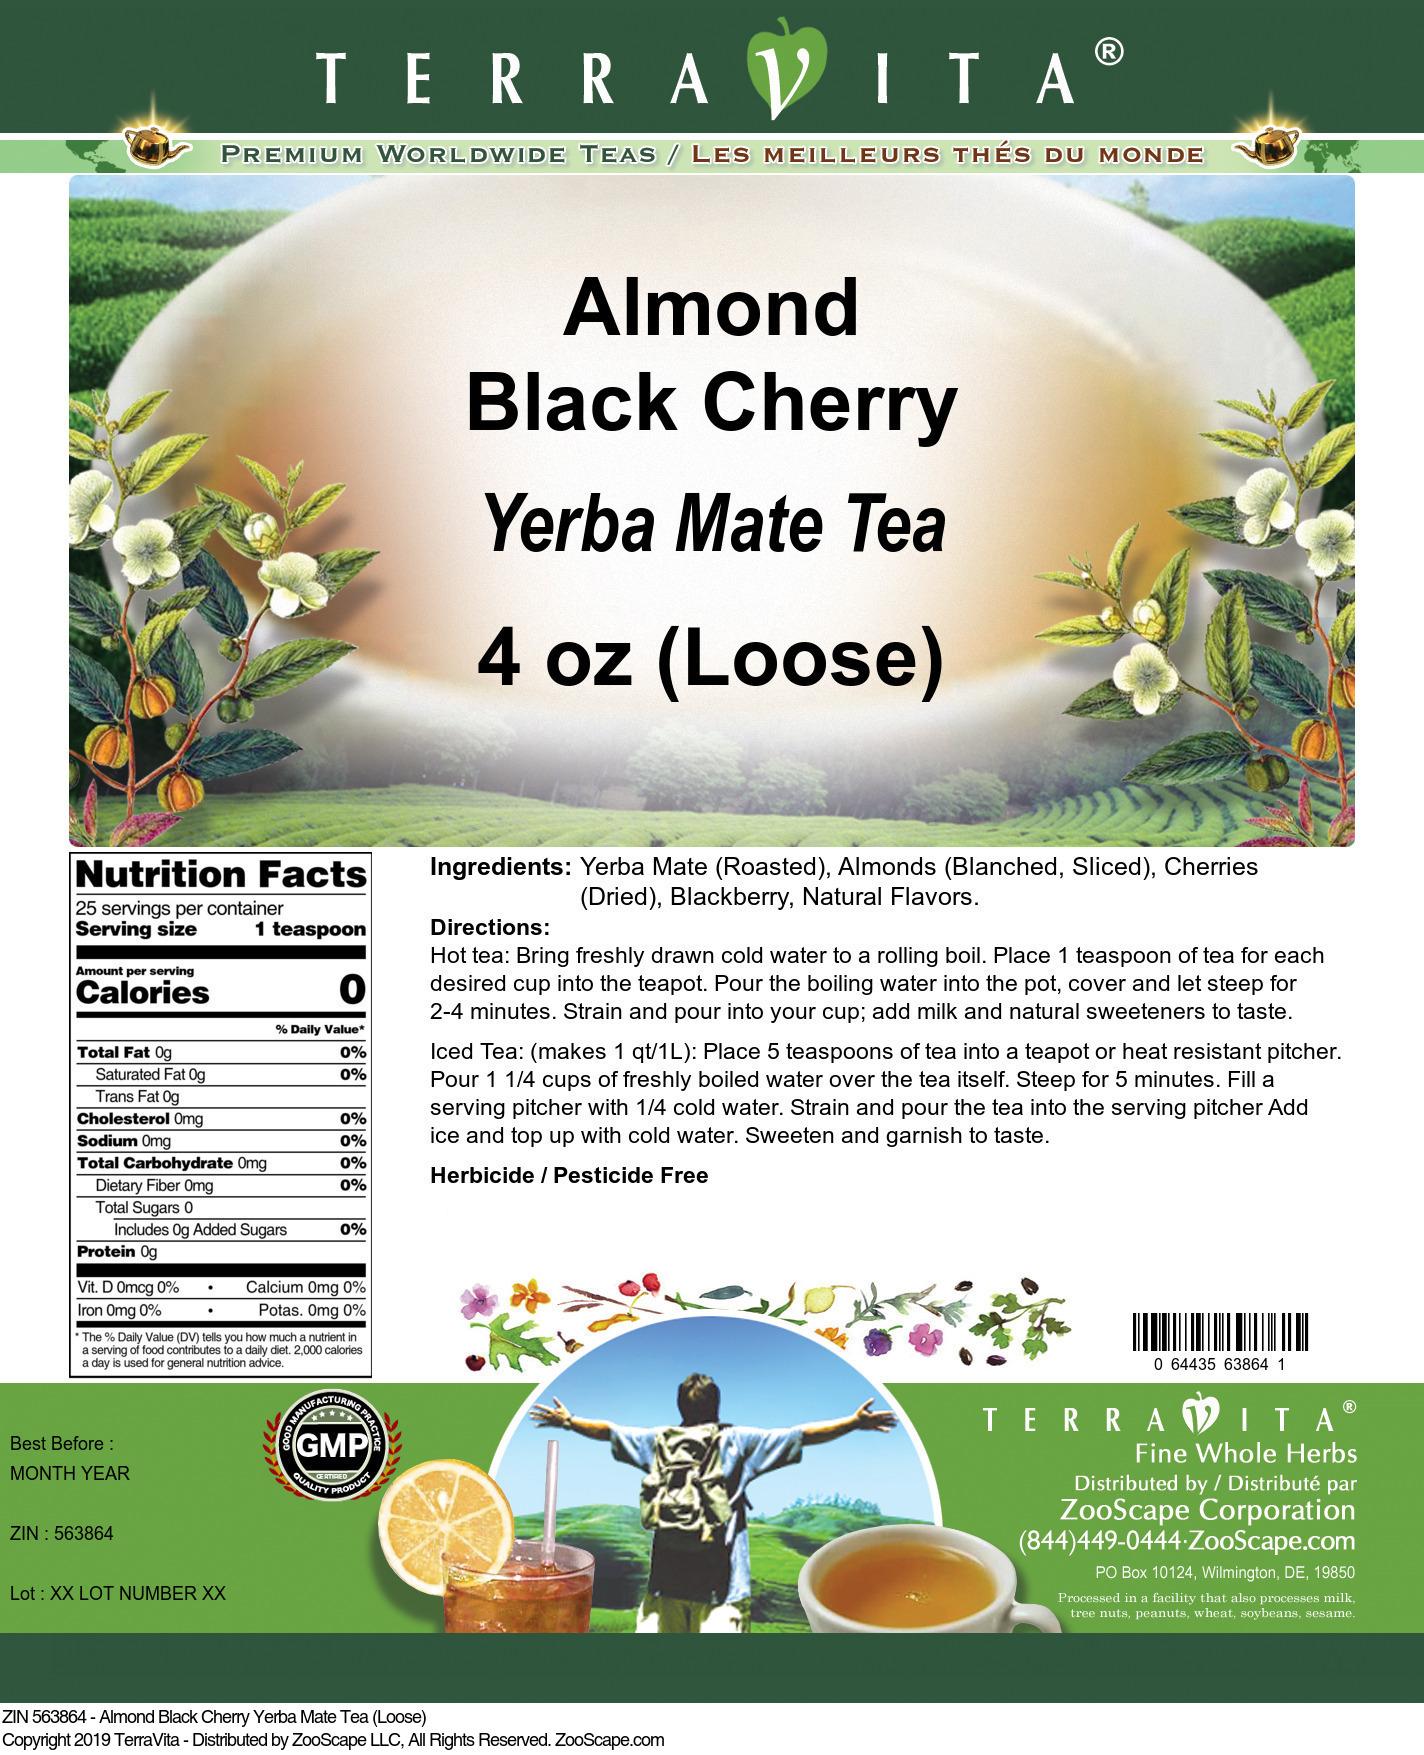 Almond Black Cherry Yerba Mate Tea (Loose)